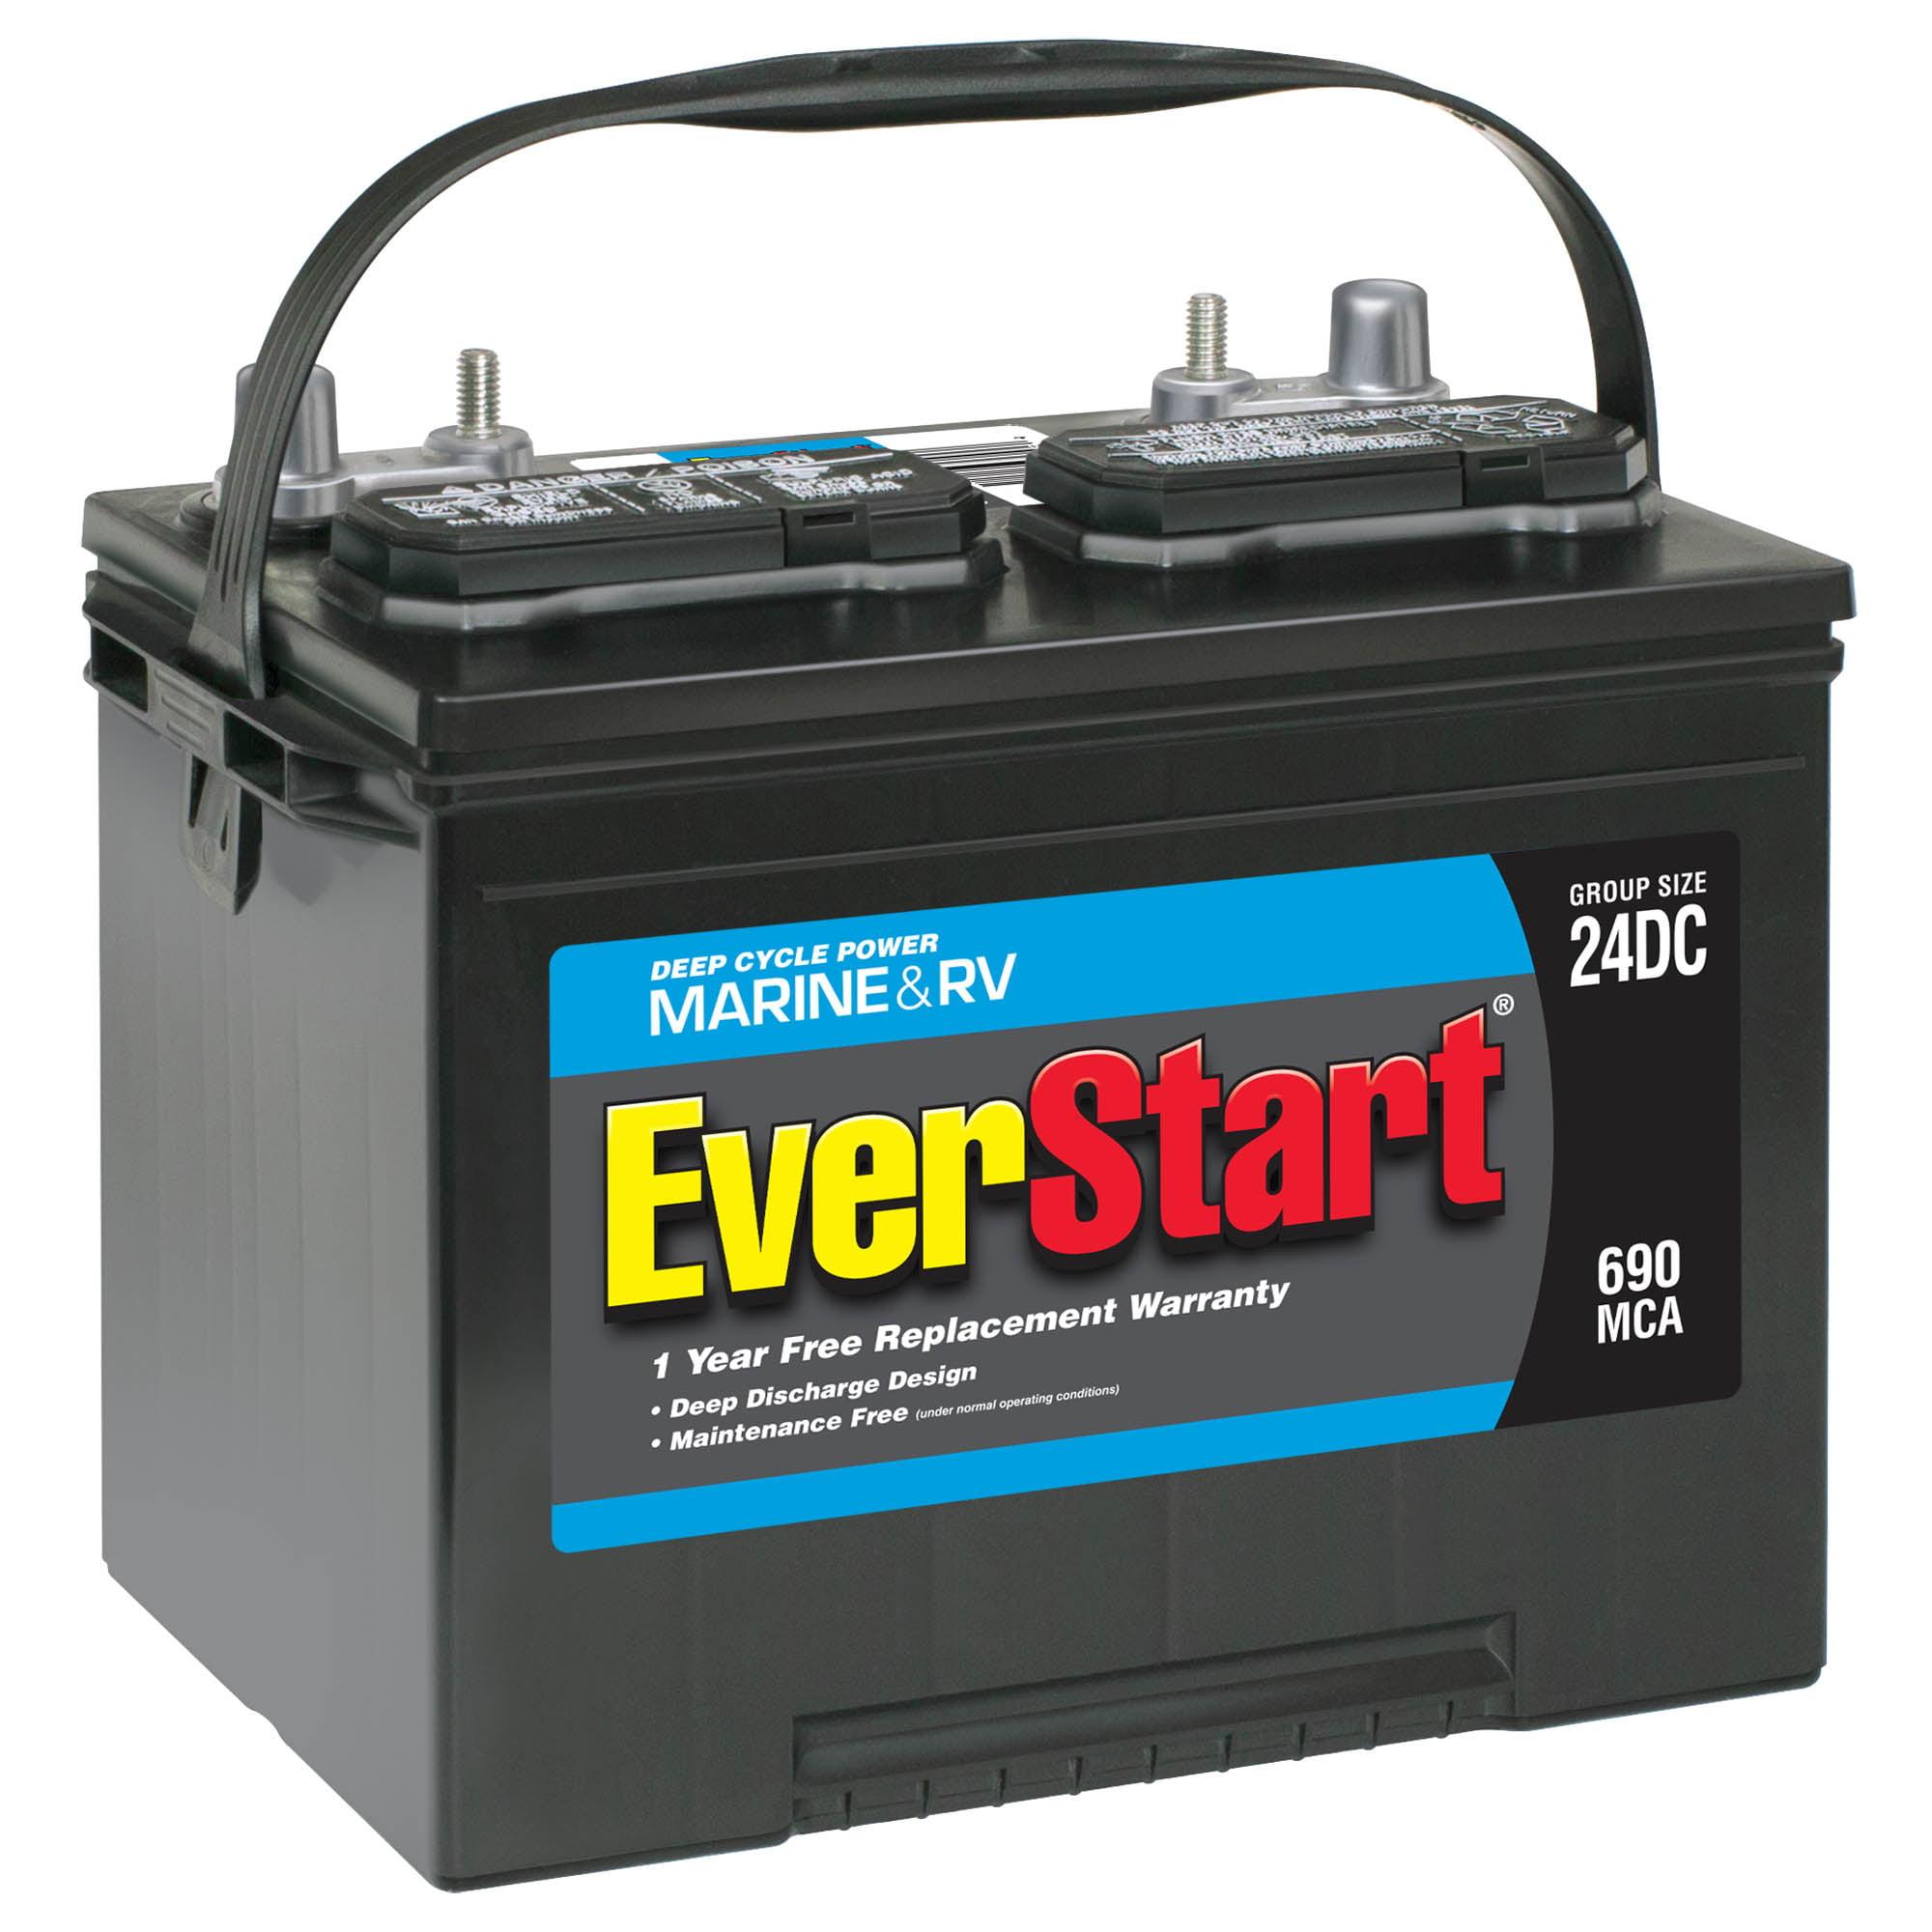 Everstart Lead Acid Marine Rv Deep Cycle Battery Group Size 24dc 12 Volt 690 Mca Walmart Com Walmart Com